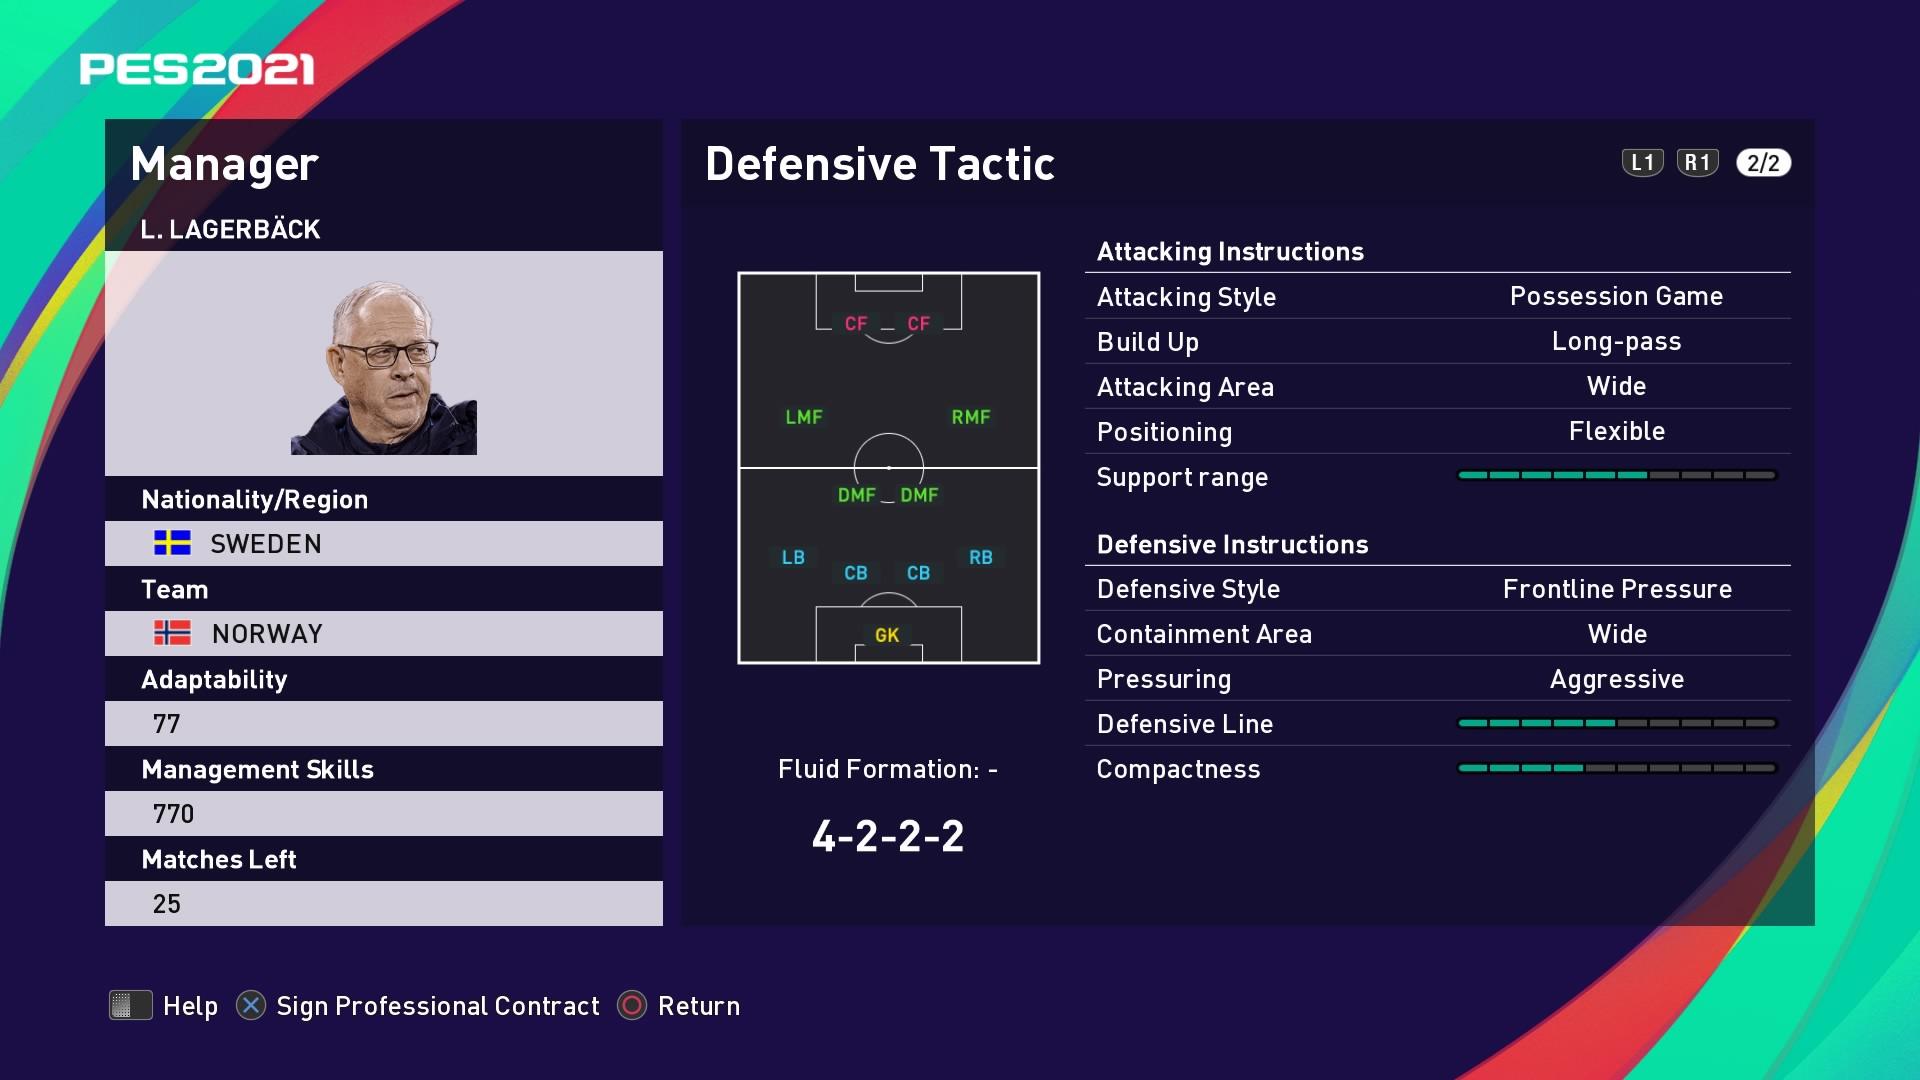 L. Lagerbäck (Lars Lagerbäck) Defensive Tactic in PES 2021 myClub